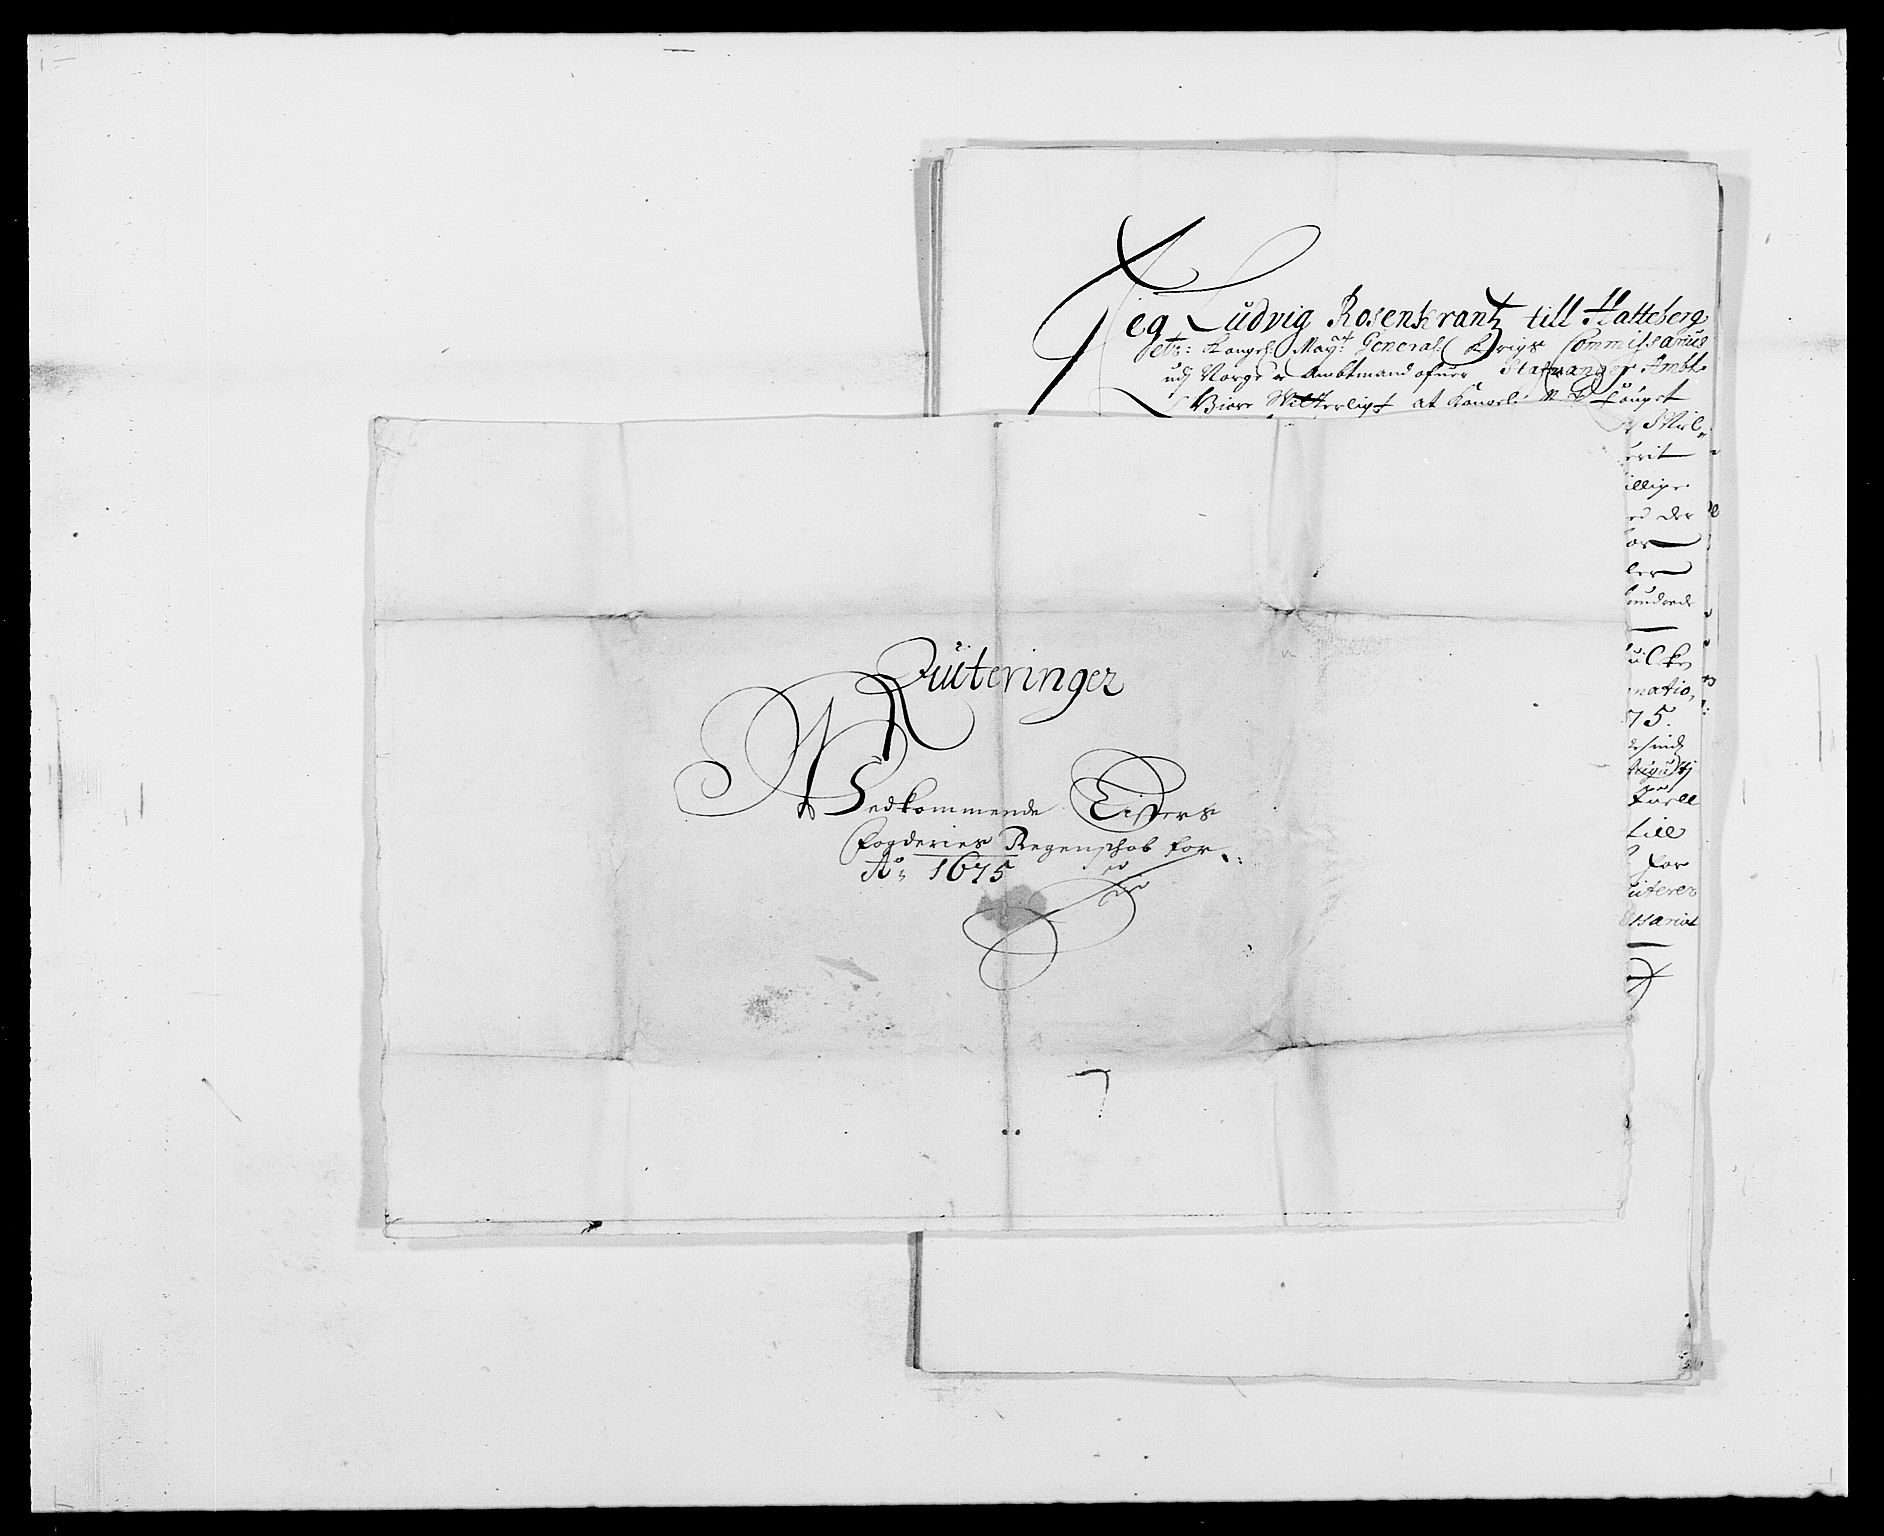 RA, Rentekammeret inntil 1814, Reviderte regnskaper, Fogderegnskap, R41/L2529: Fogderegnskap Lista, 1675-1676, s. 98